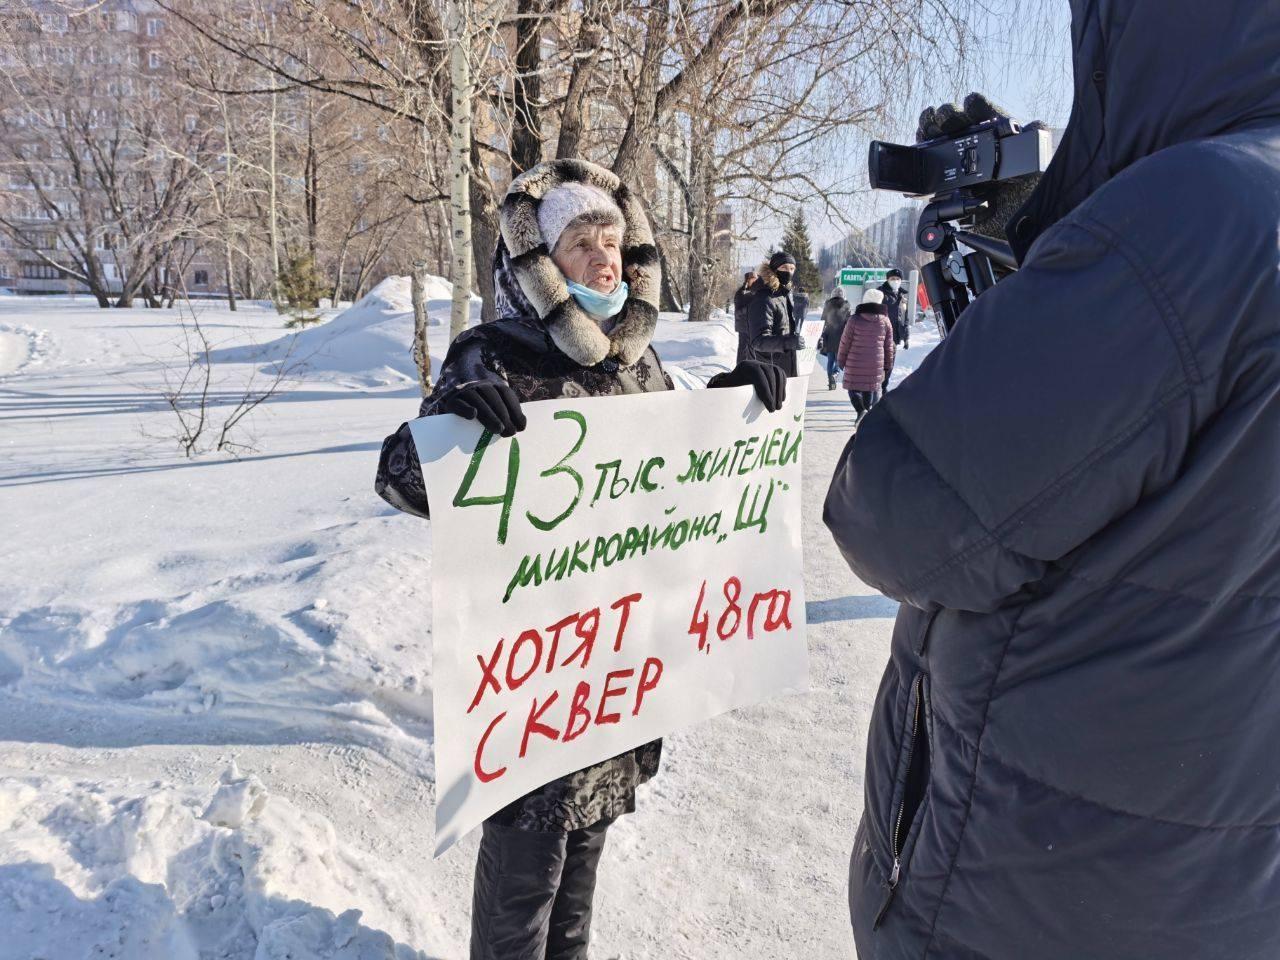 Участники акции протестовали против передачи части сквера под застройку